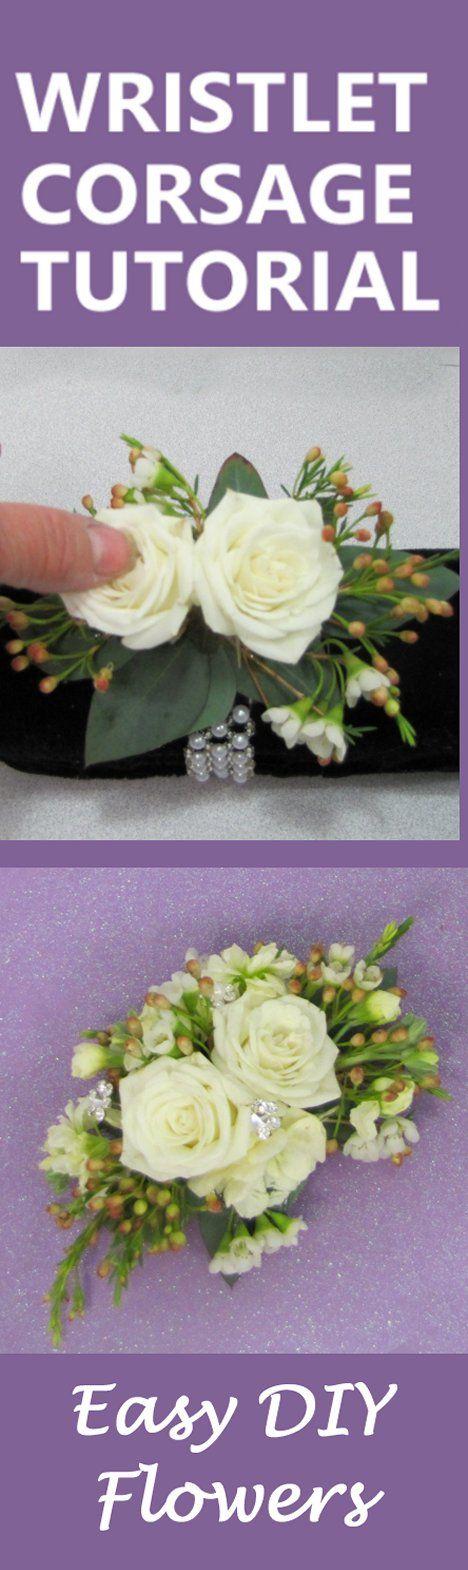 How to Make a Wrist Corsage - Free DIY Wedding Flower Tutorials ...